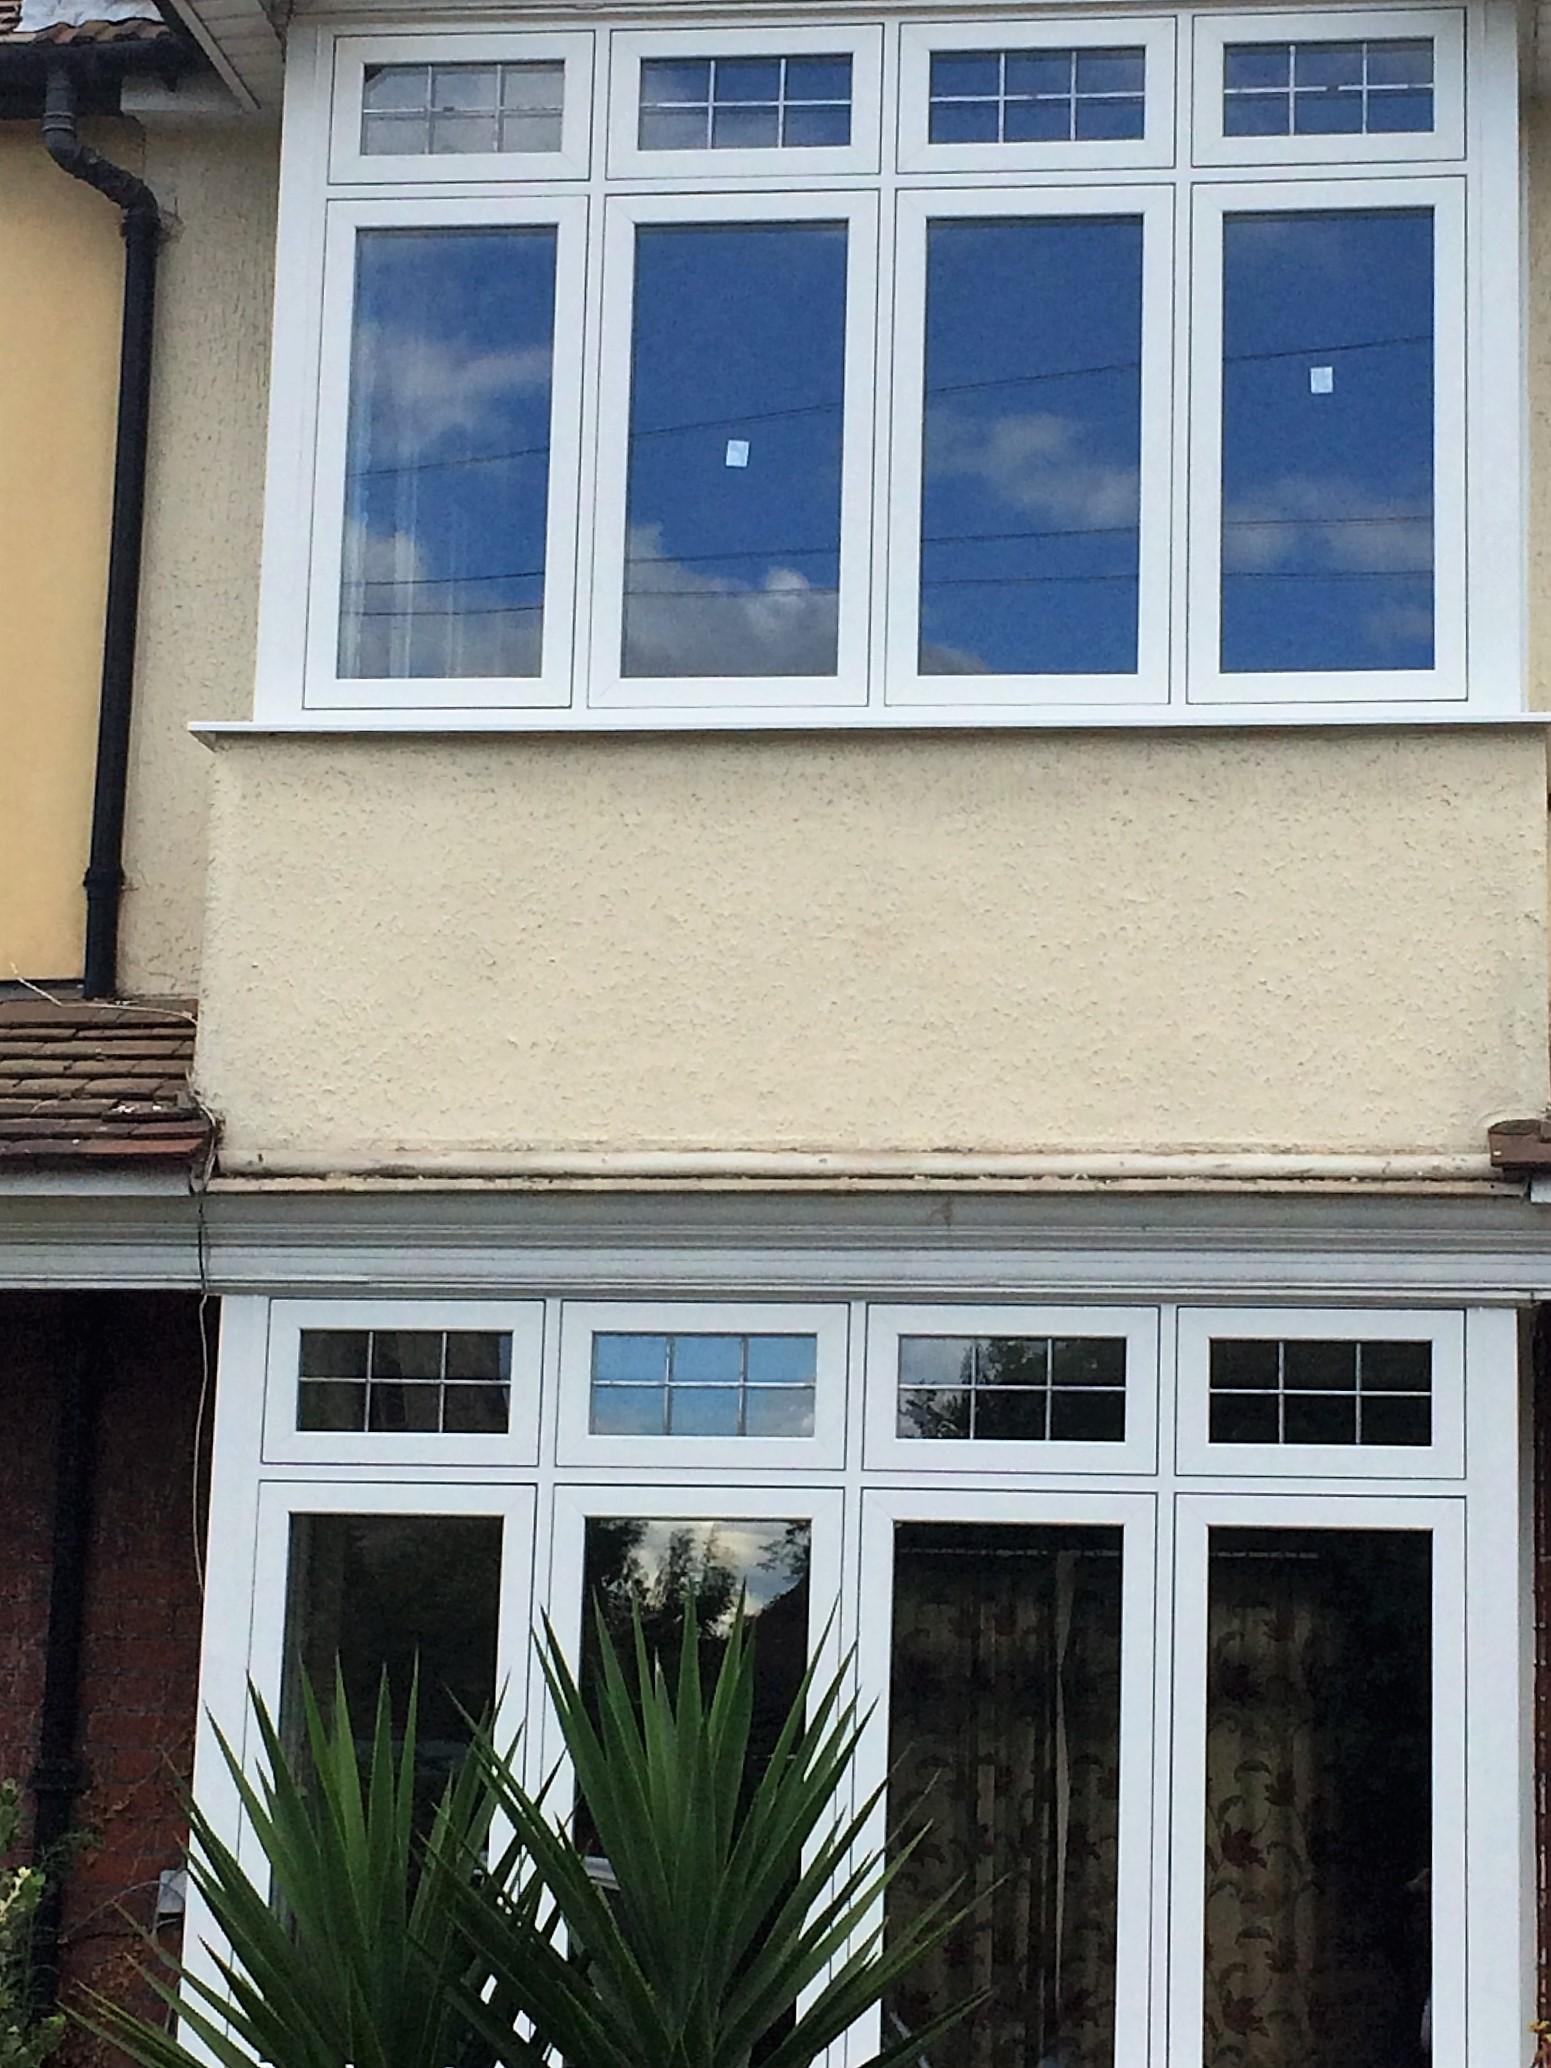 Main photo for Kew Windows